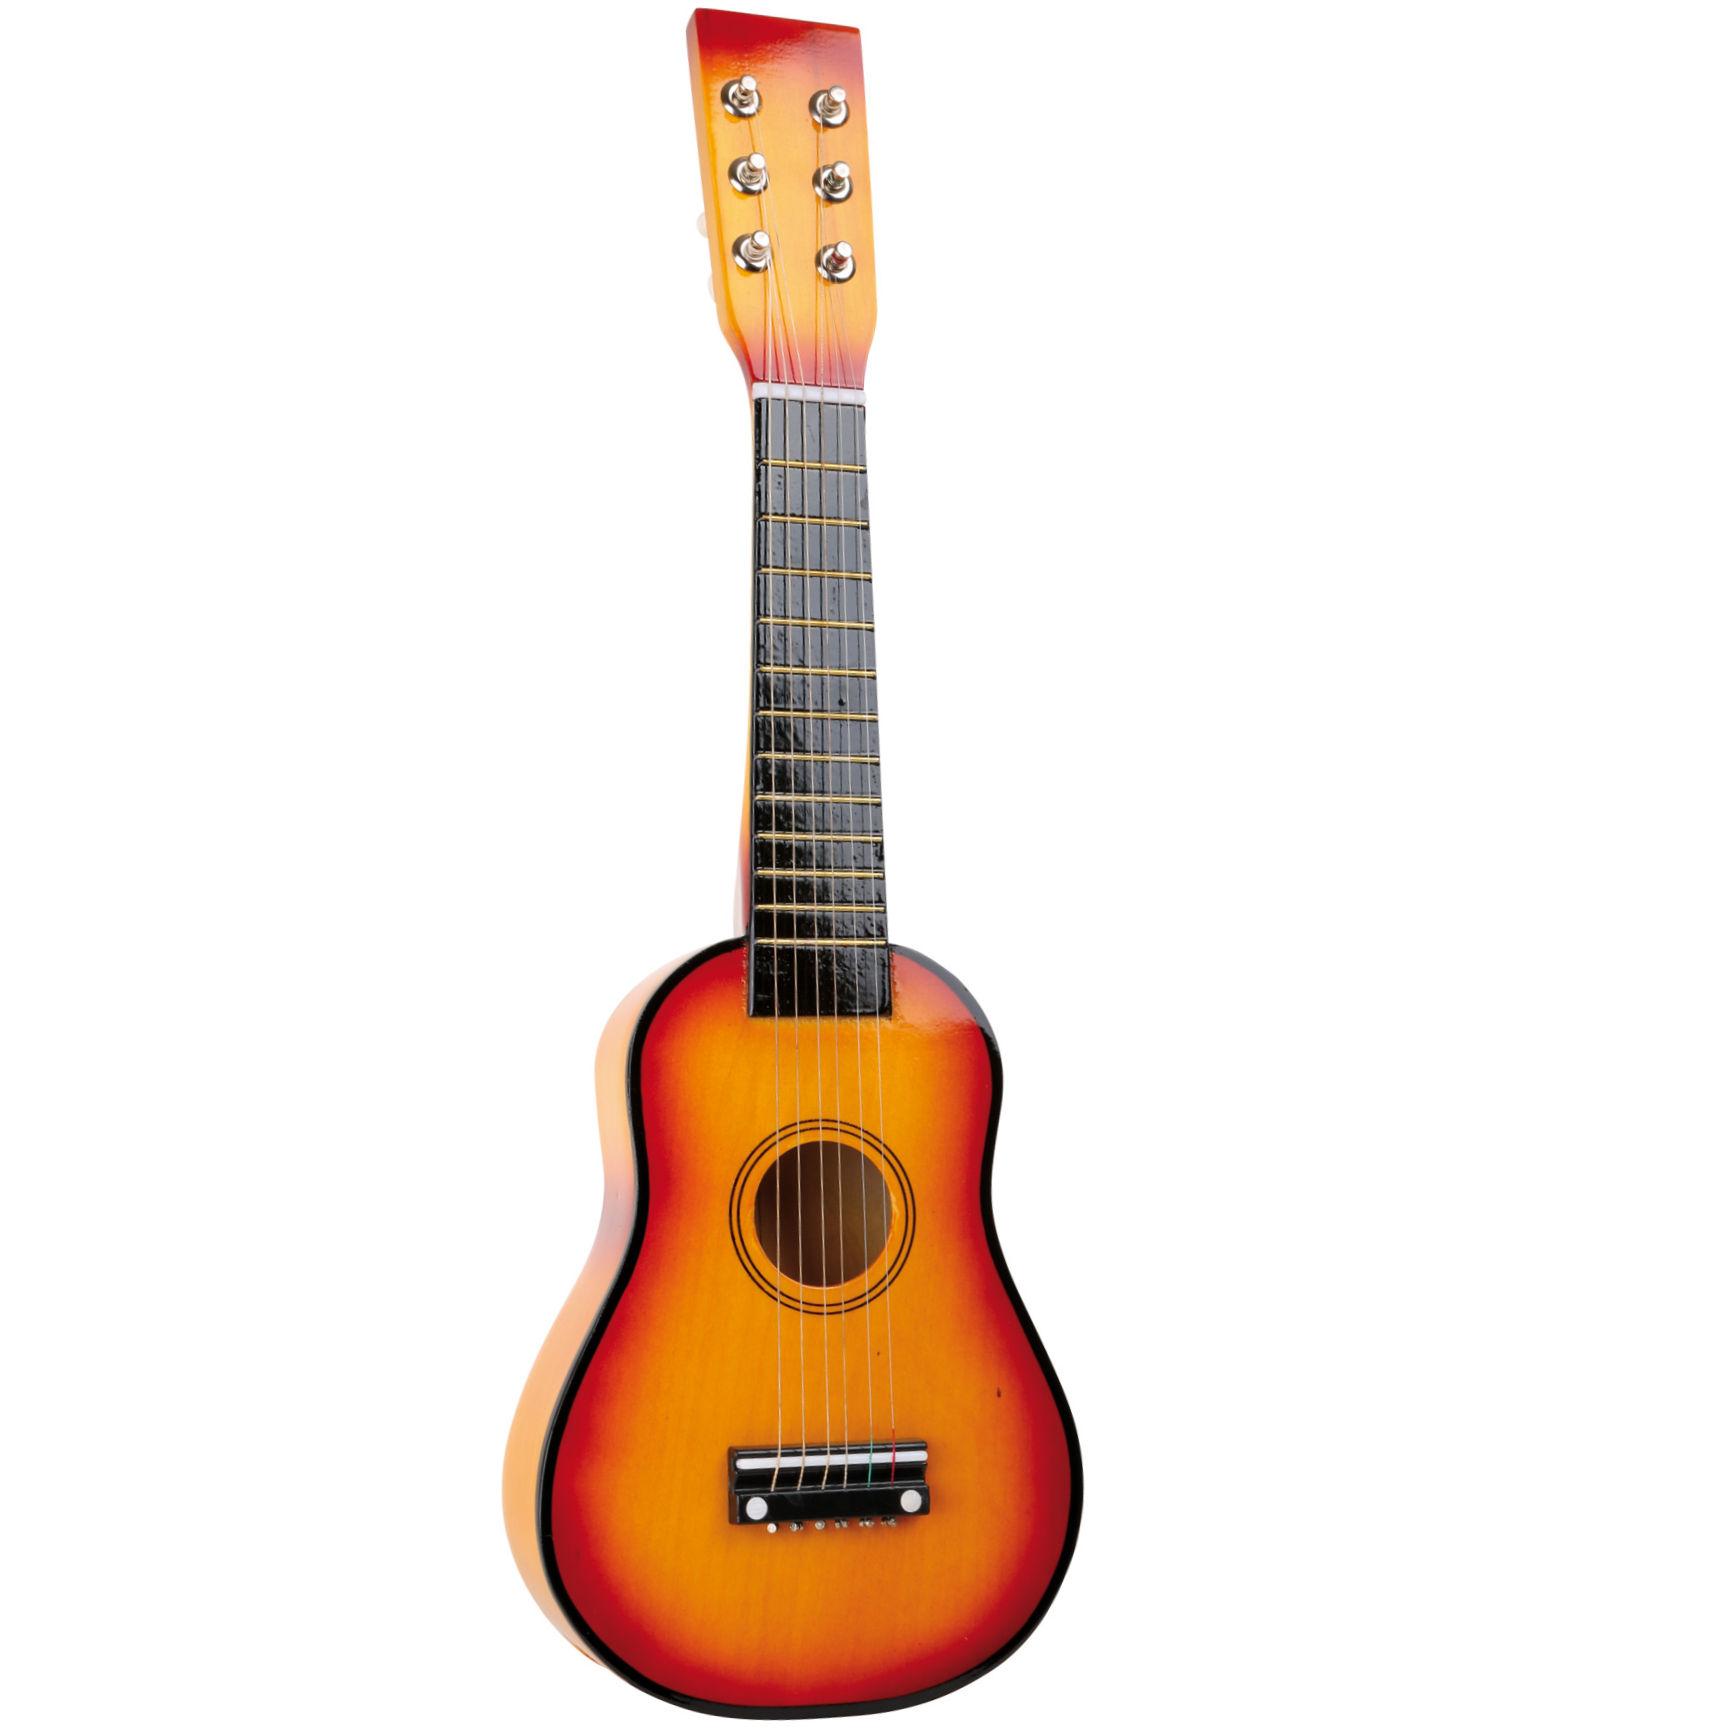 Baby Guitar Classic Sunburst 53 cm Drevo